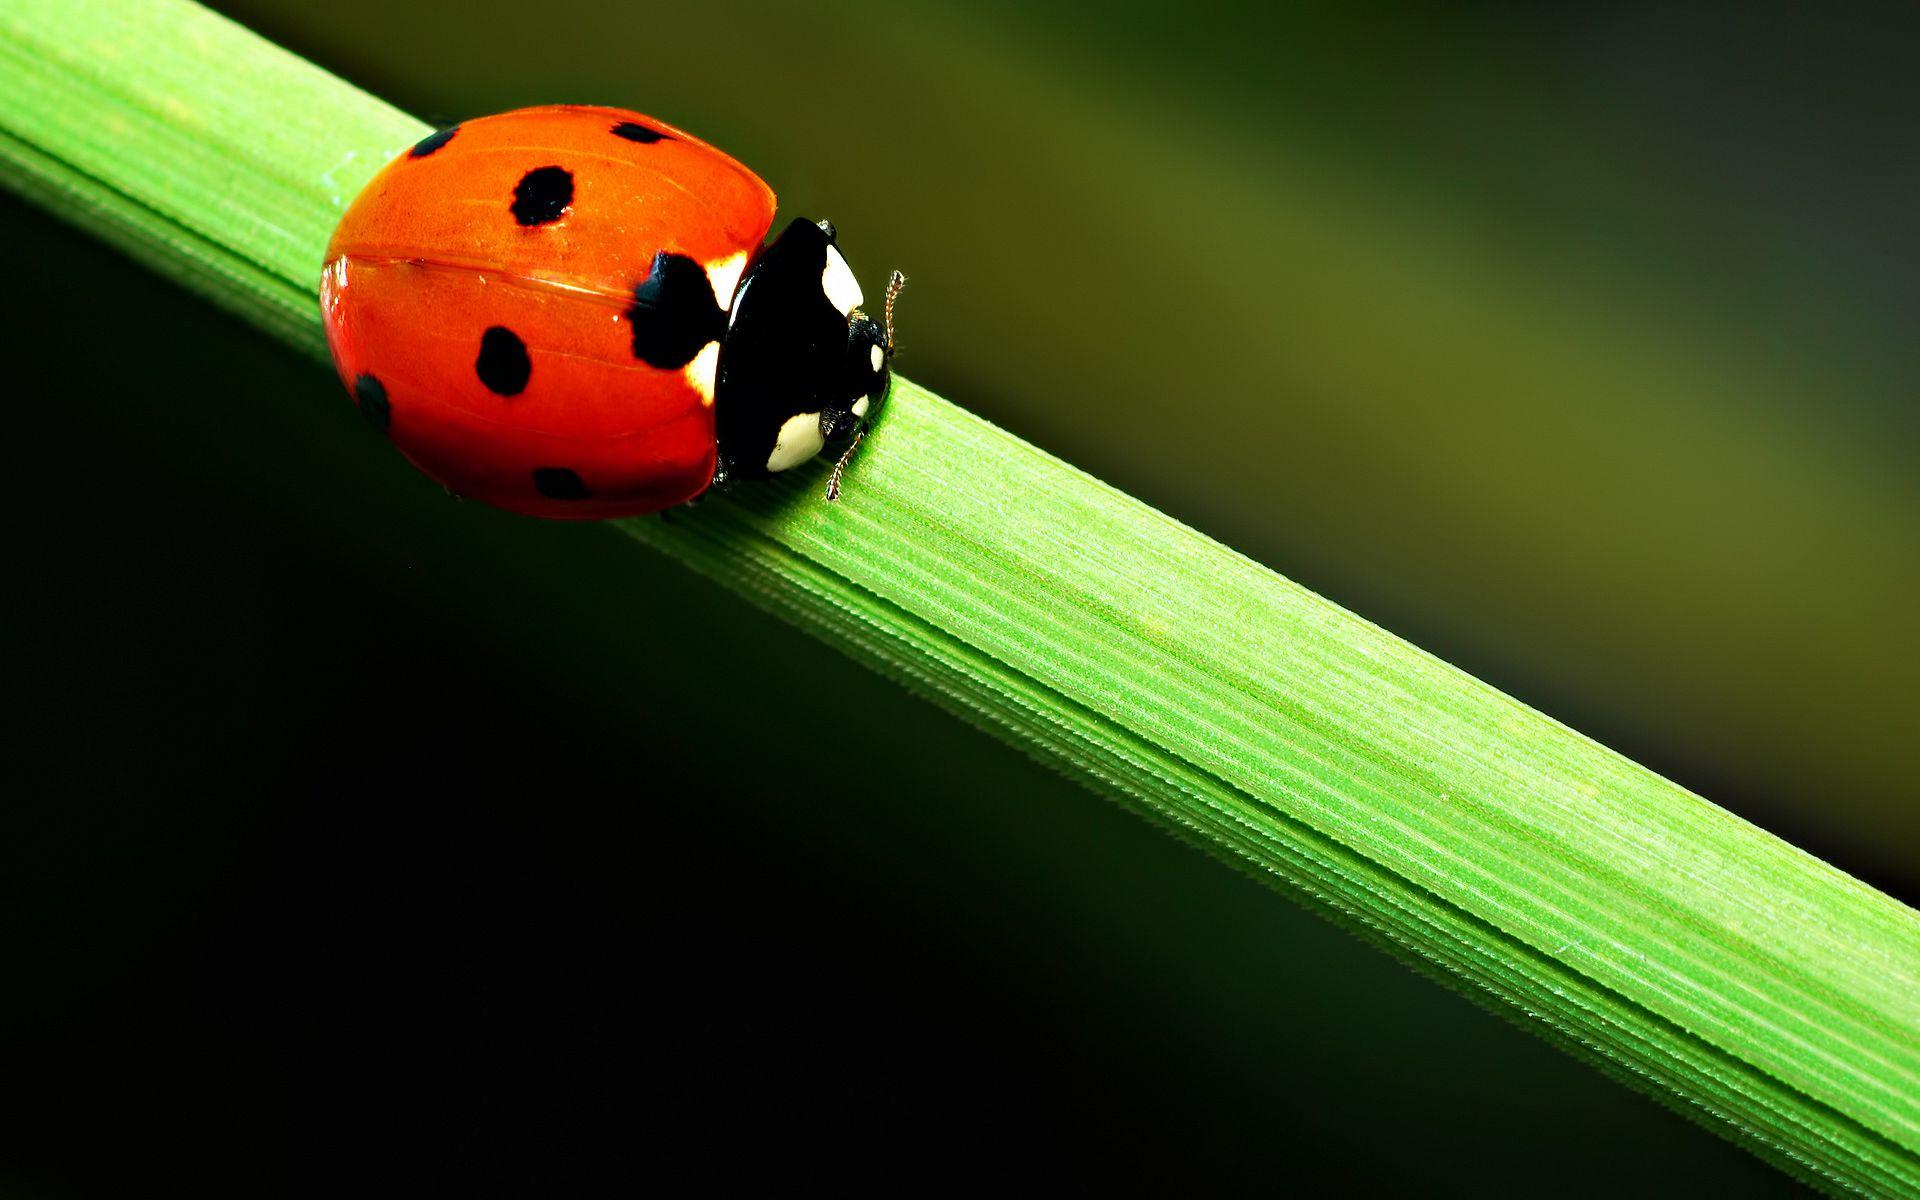 red hd ladybug image